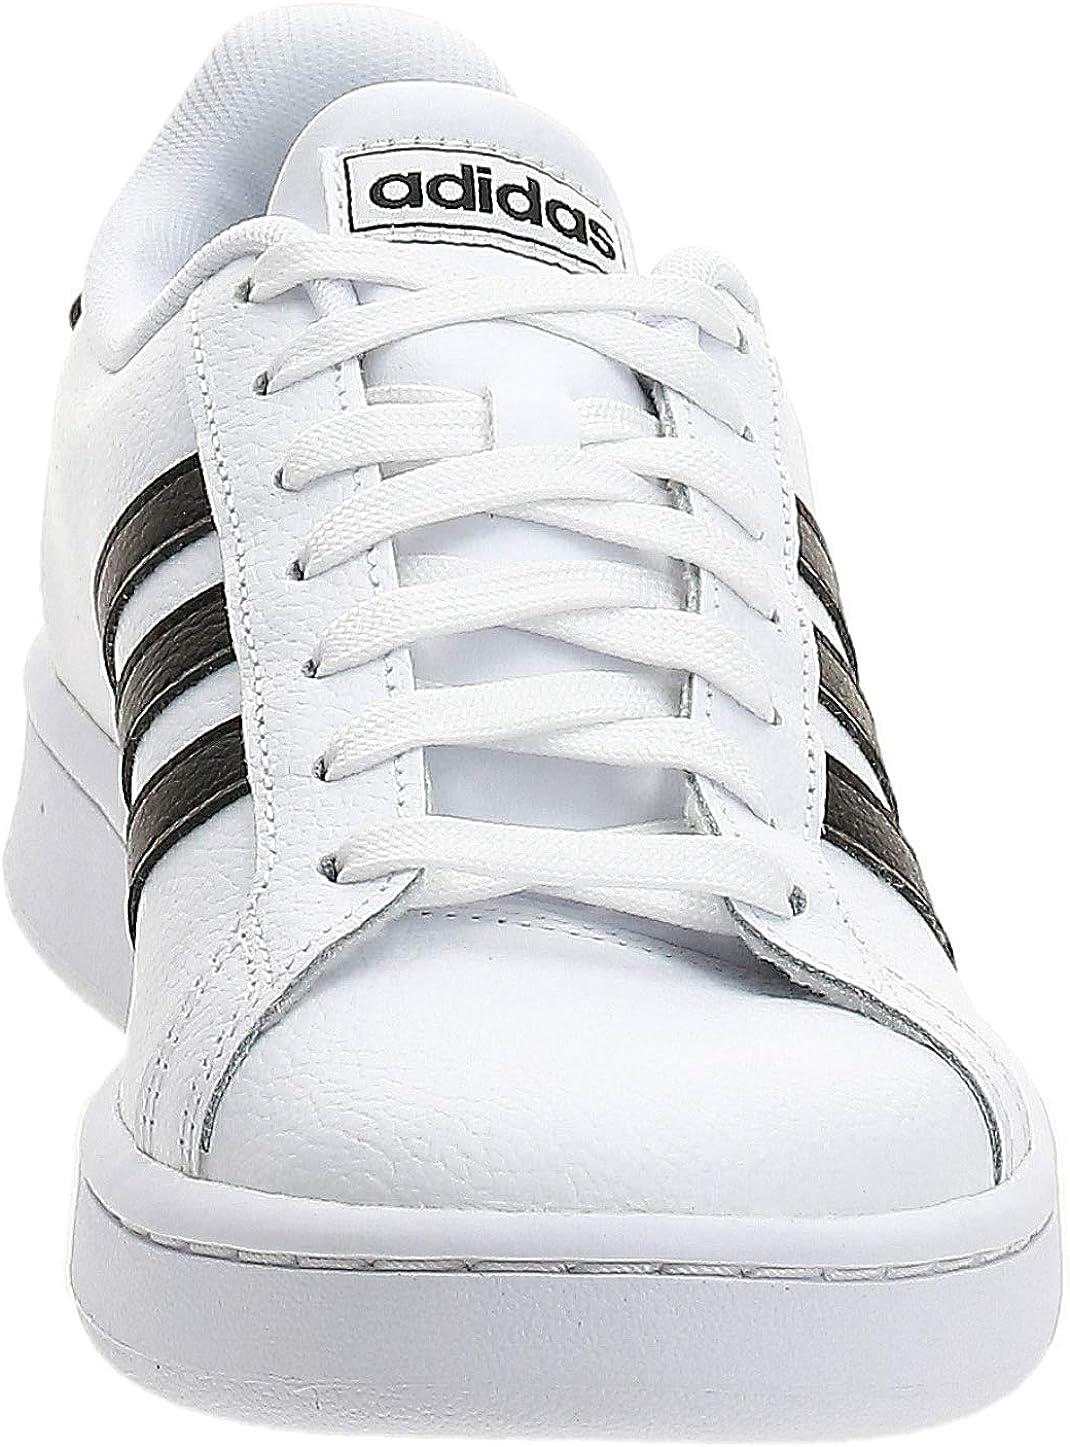 adidas Grand Court, Chaussures de Tennis Mixte